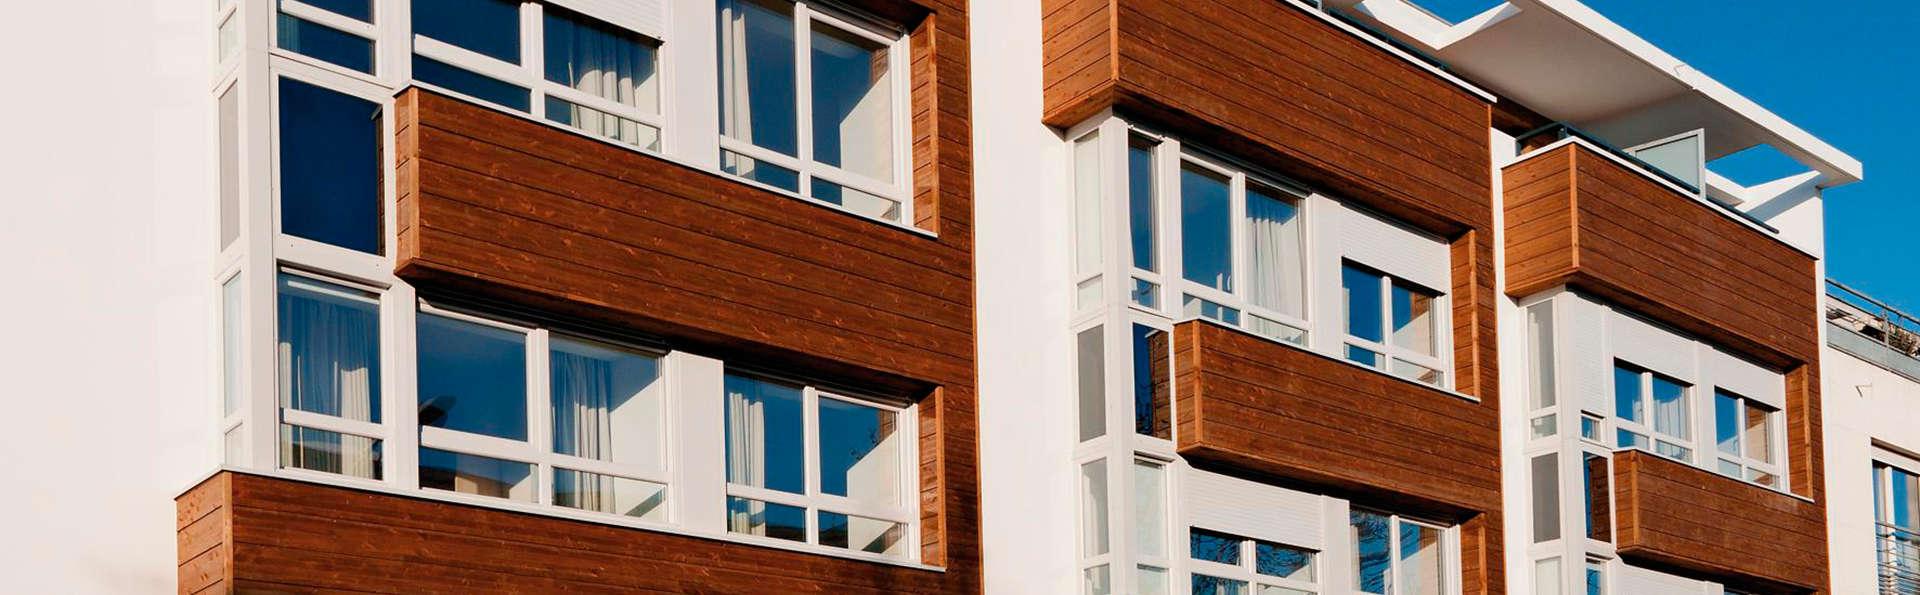 Appart'Hôtel L'Escale Marine - EDIT_front.jpg